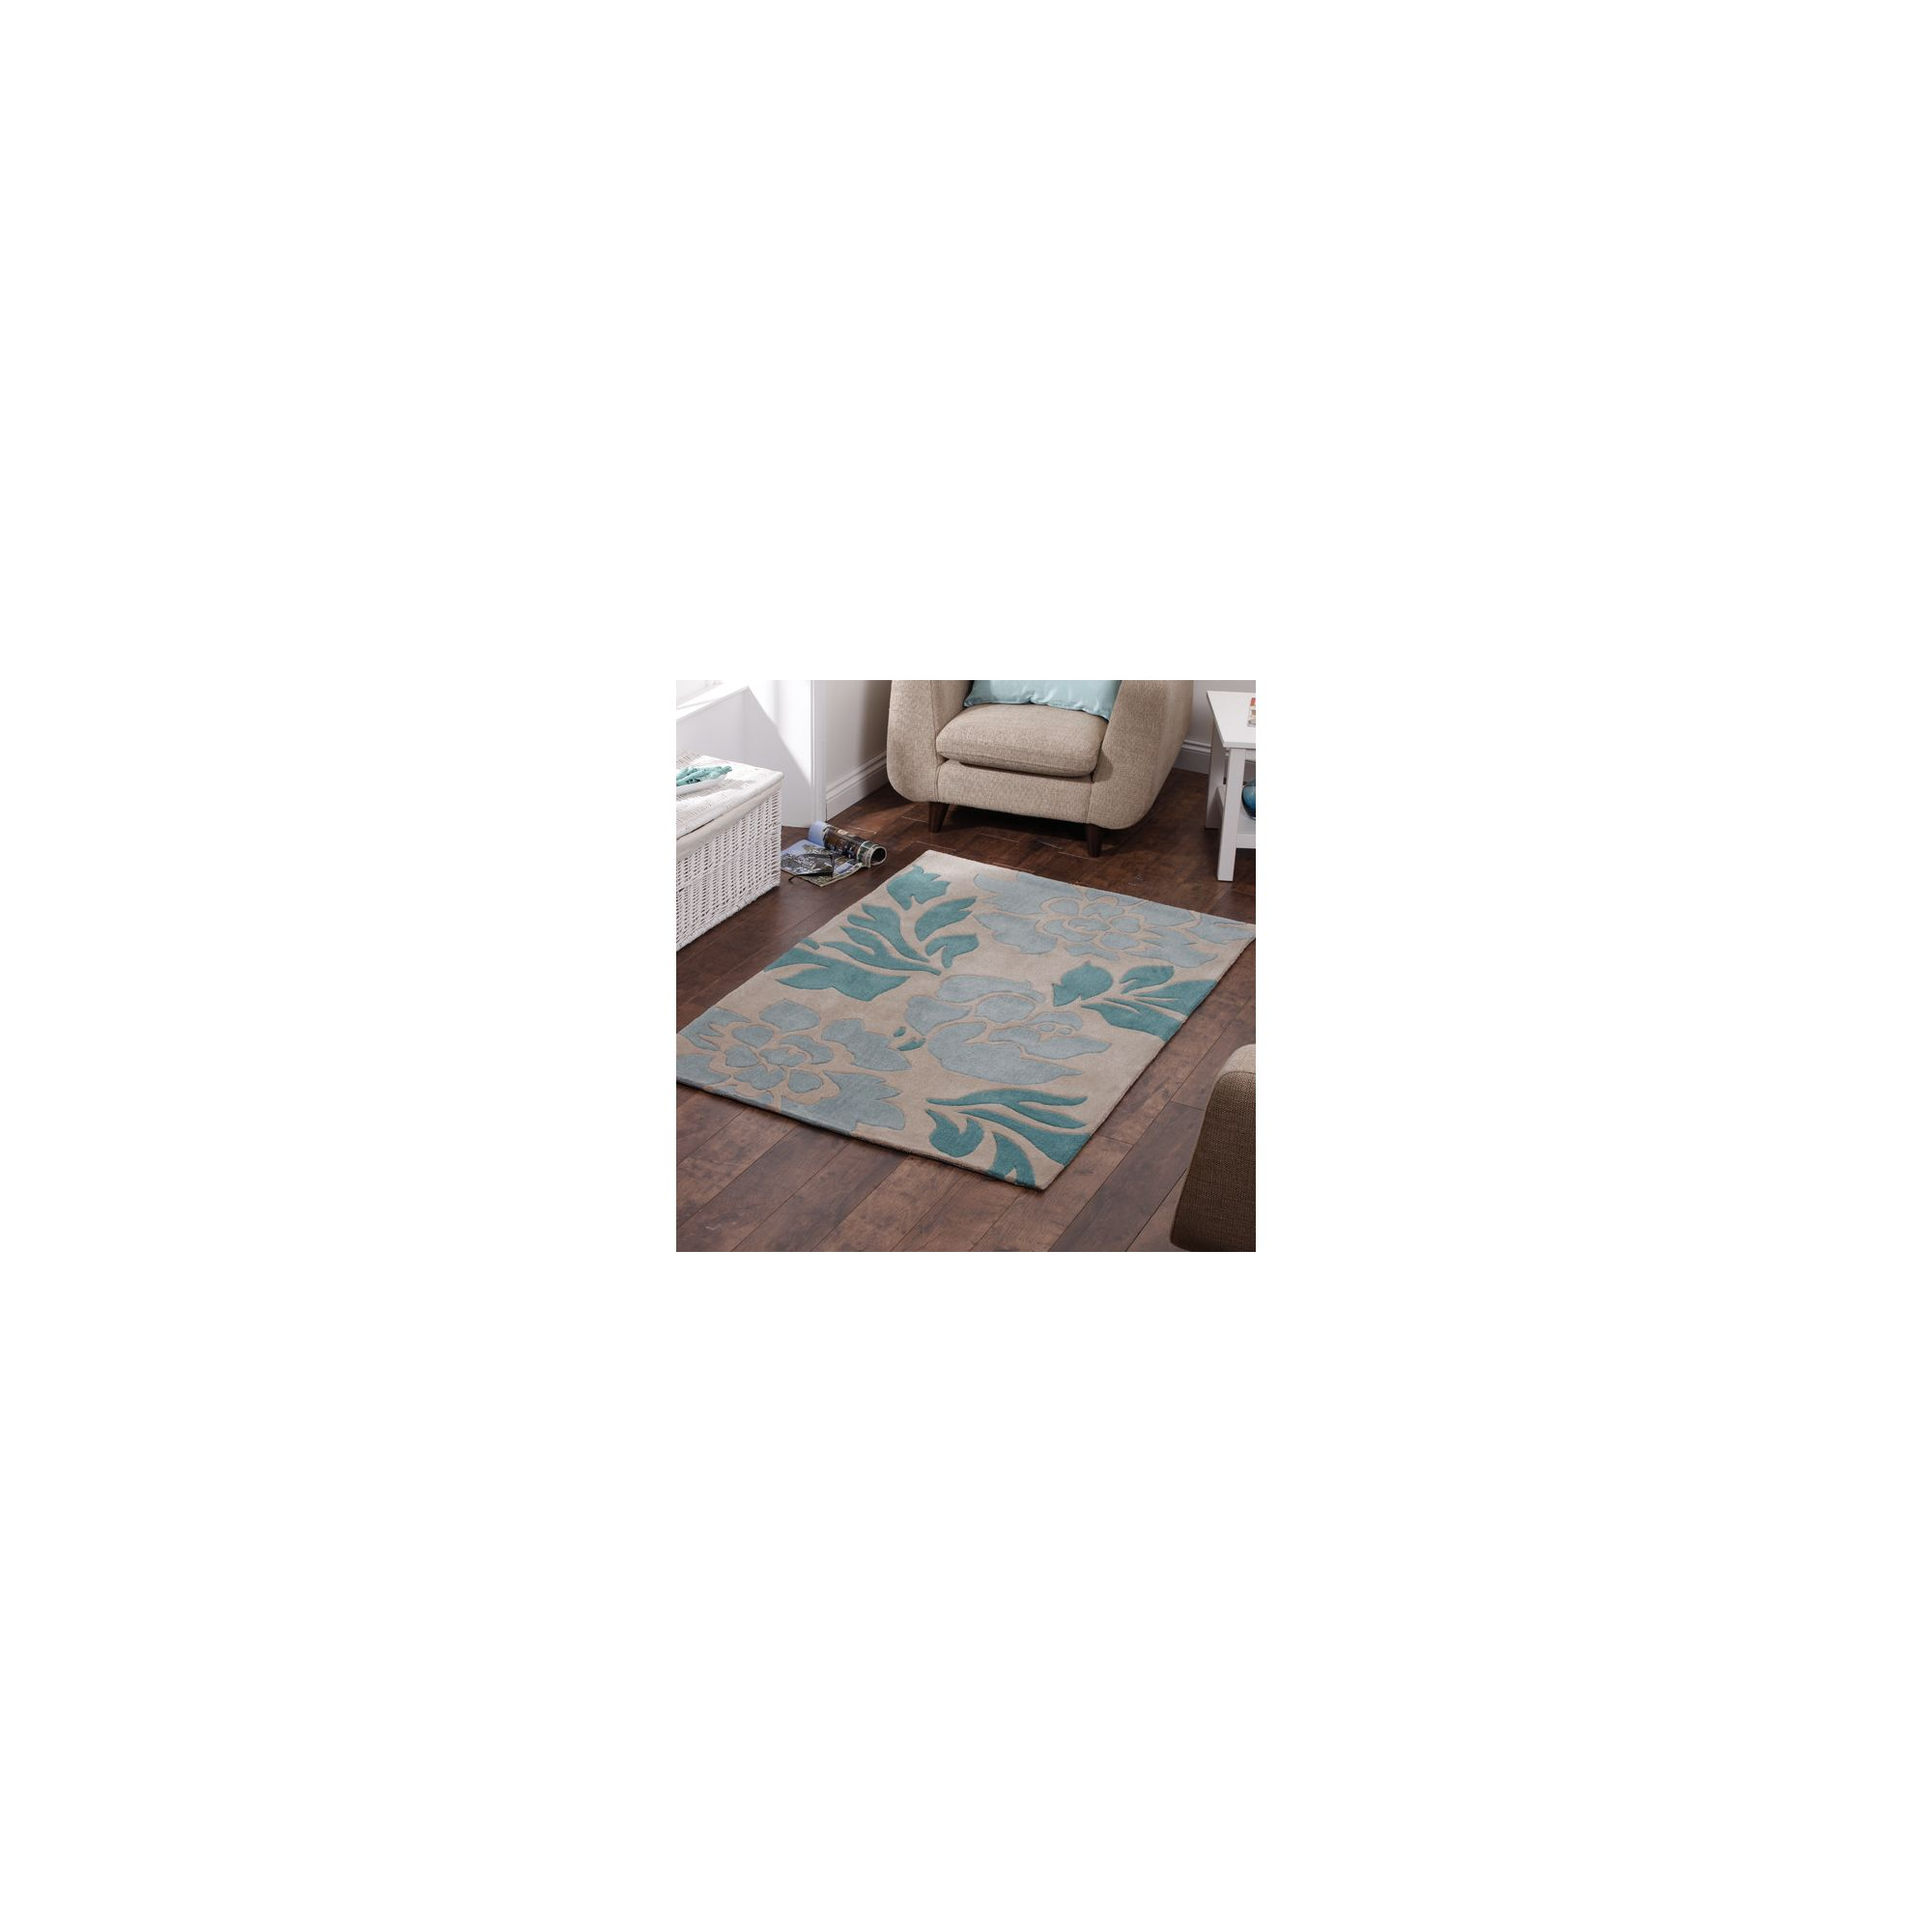 Oriental Carpets & Rugs Hong Kong 33L Beige/Blue Rug - 90cm x 150cm